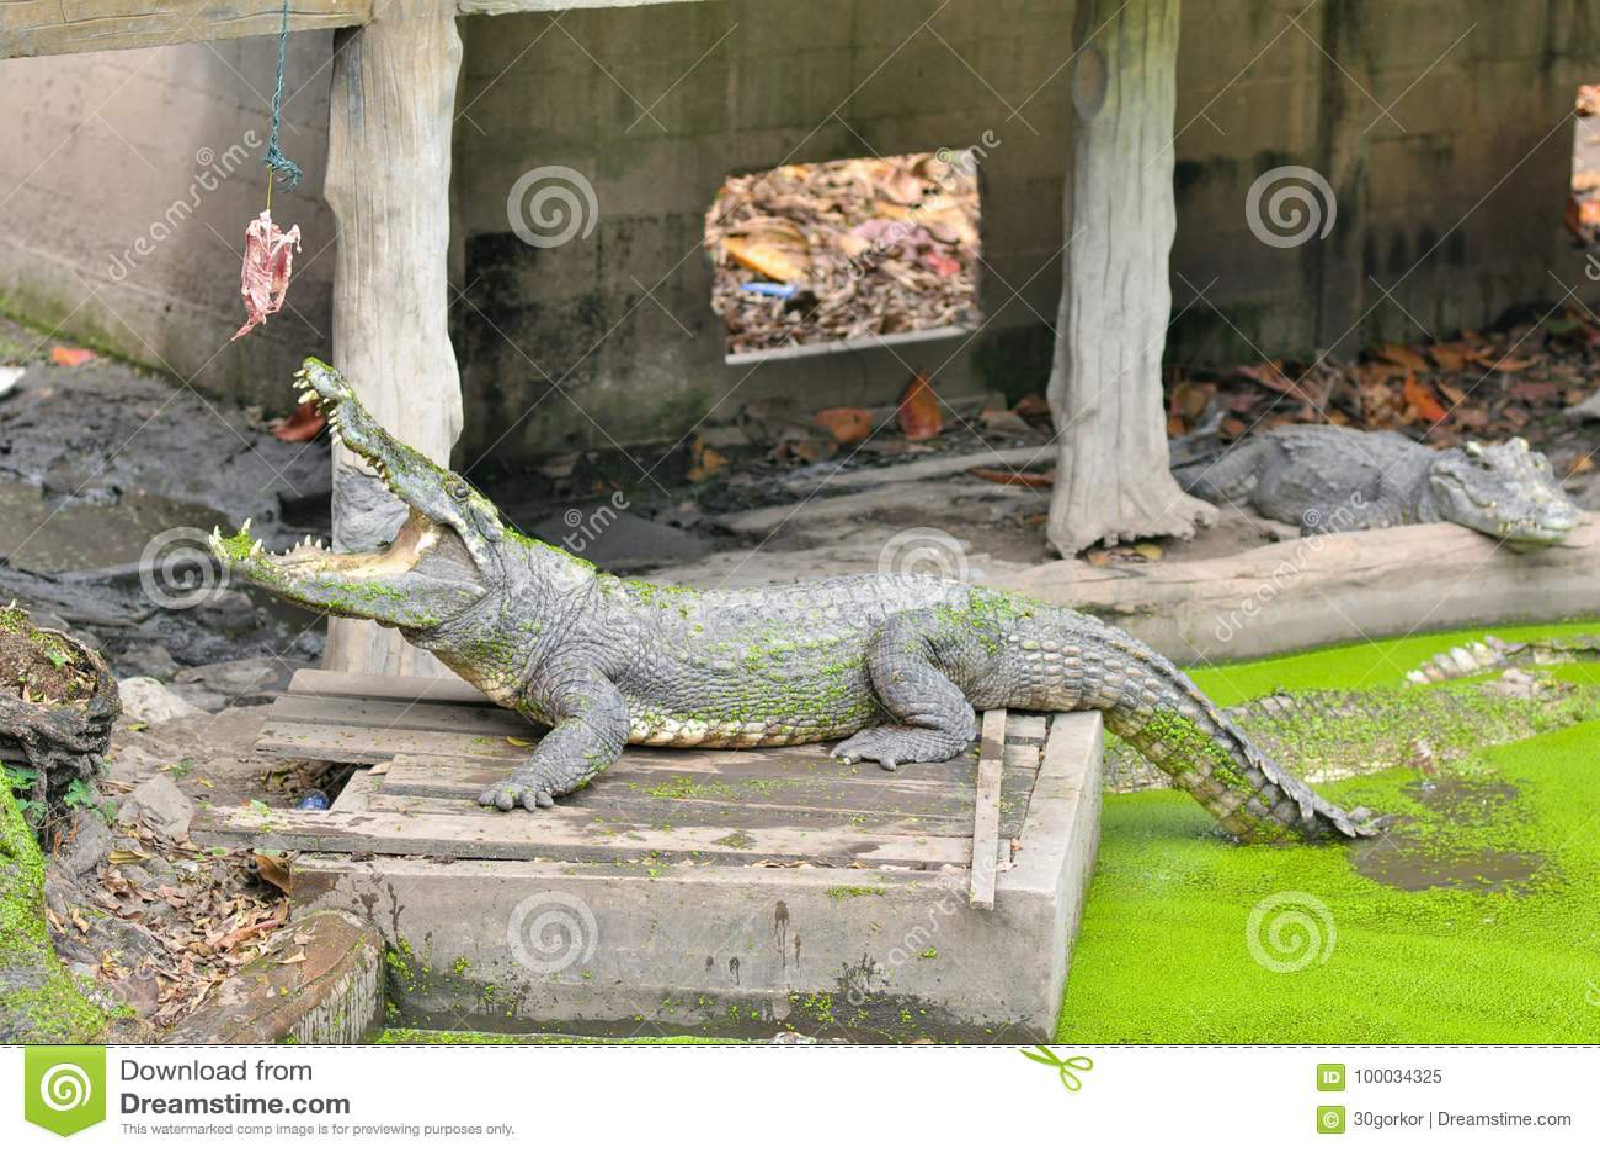 Attente de crocodile alimenter dans la ferme